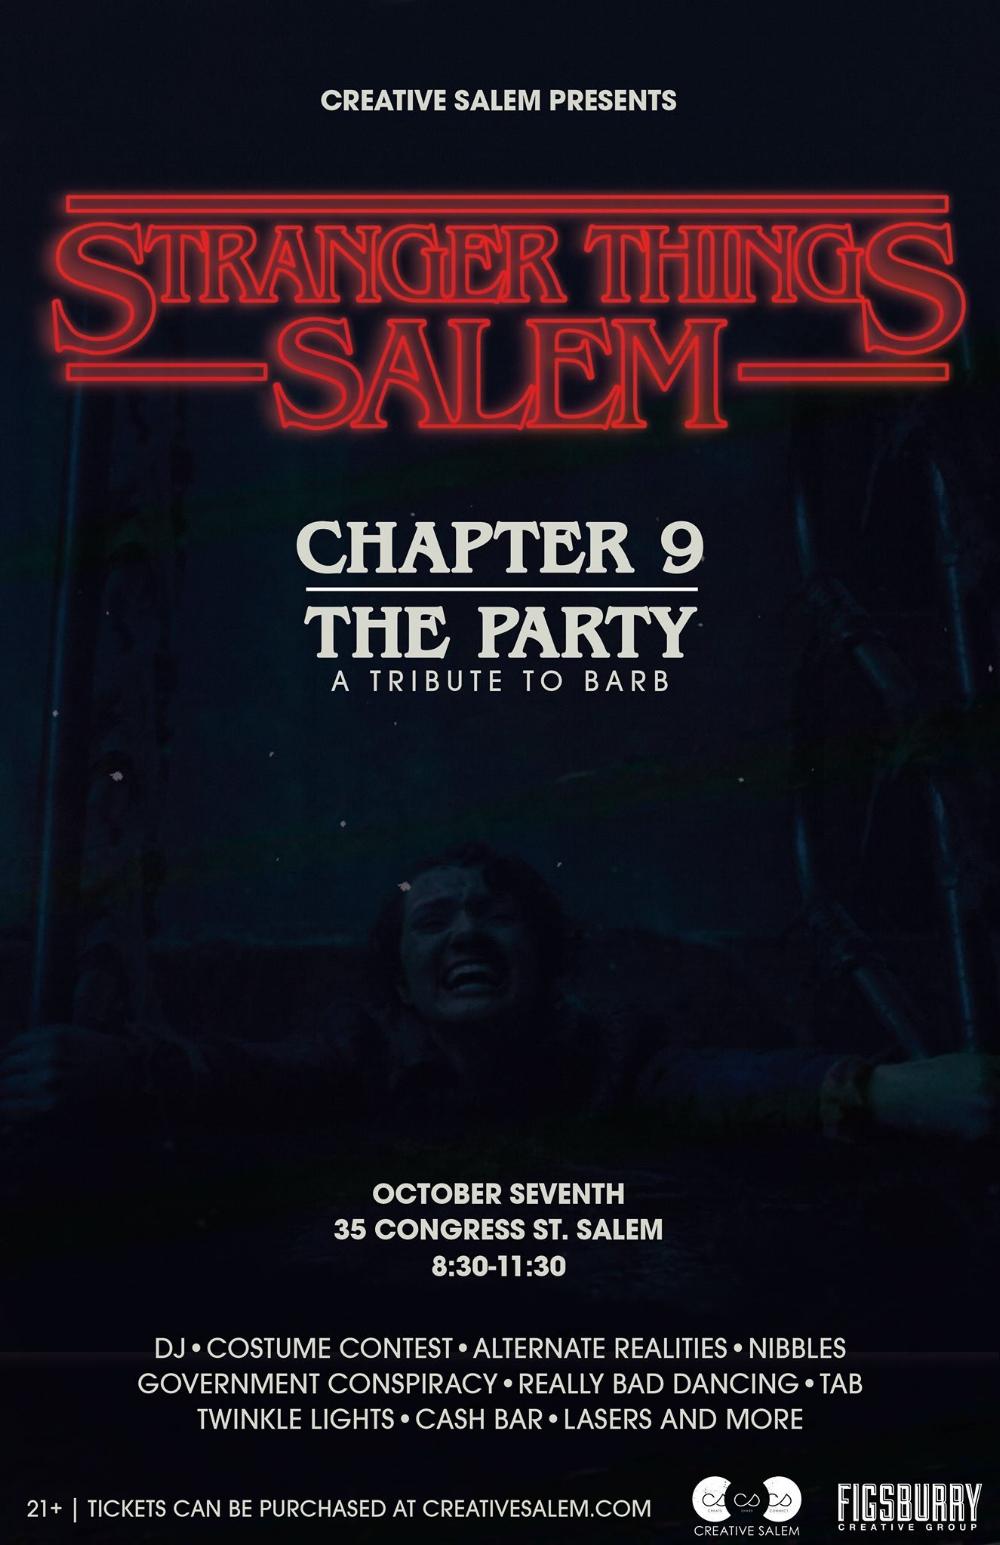 October 7 8:30-11:30 35 Congress St. Salem